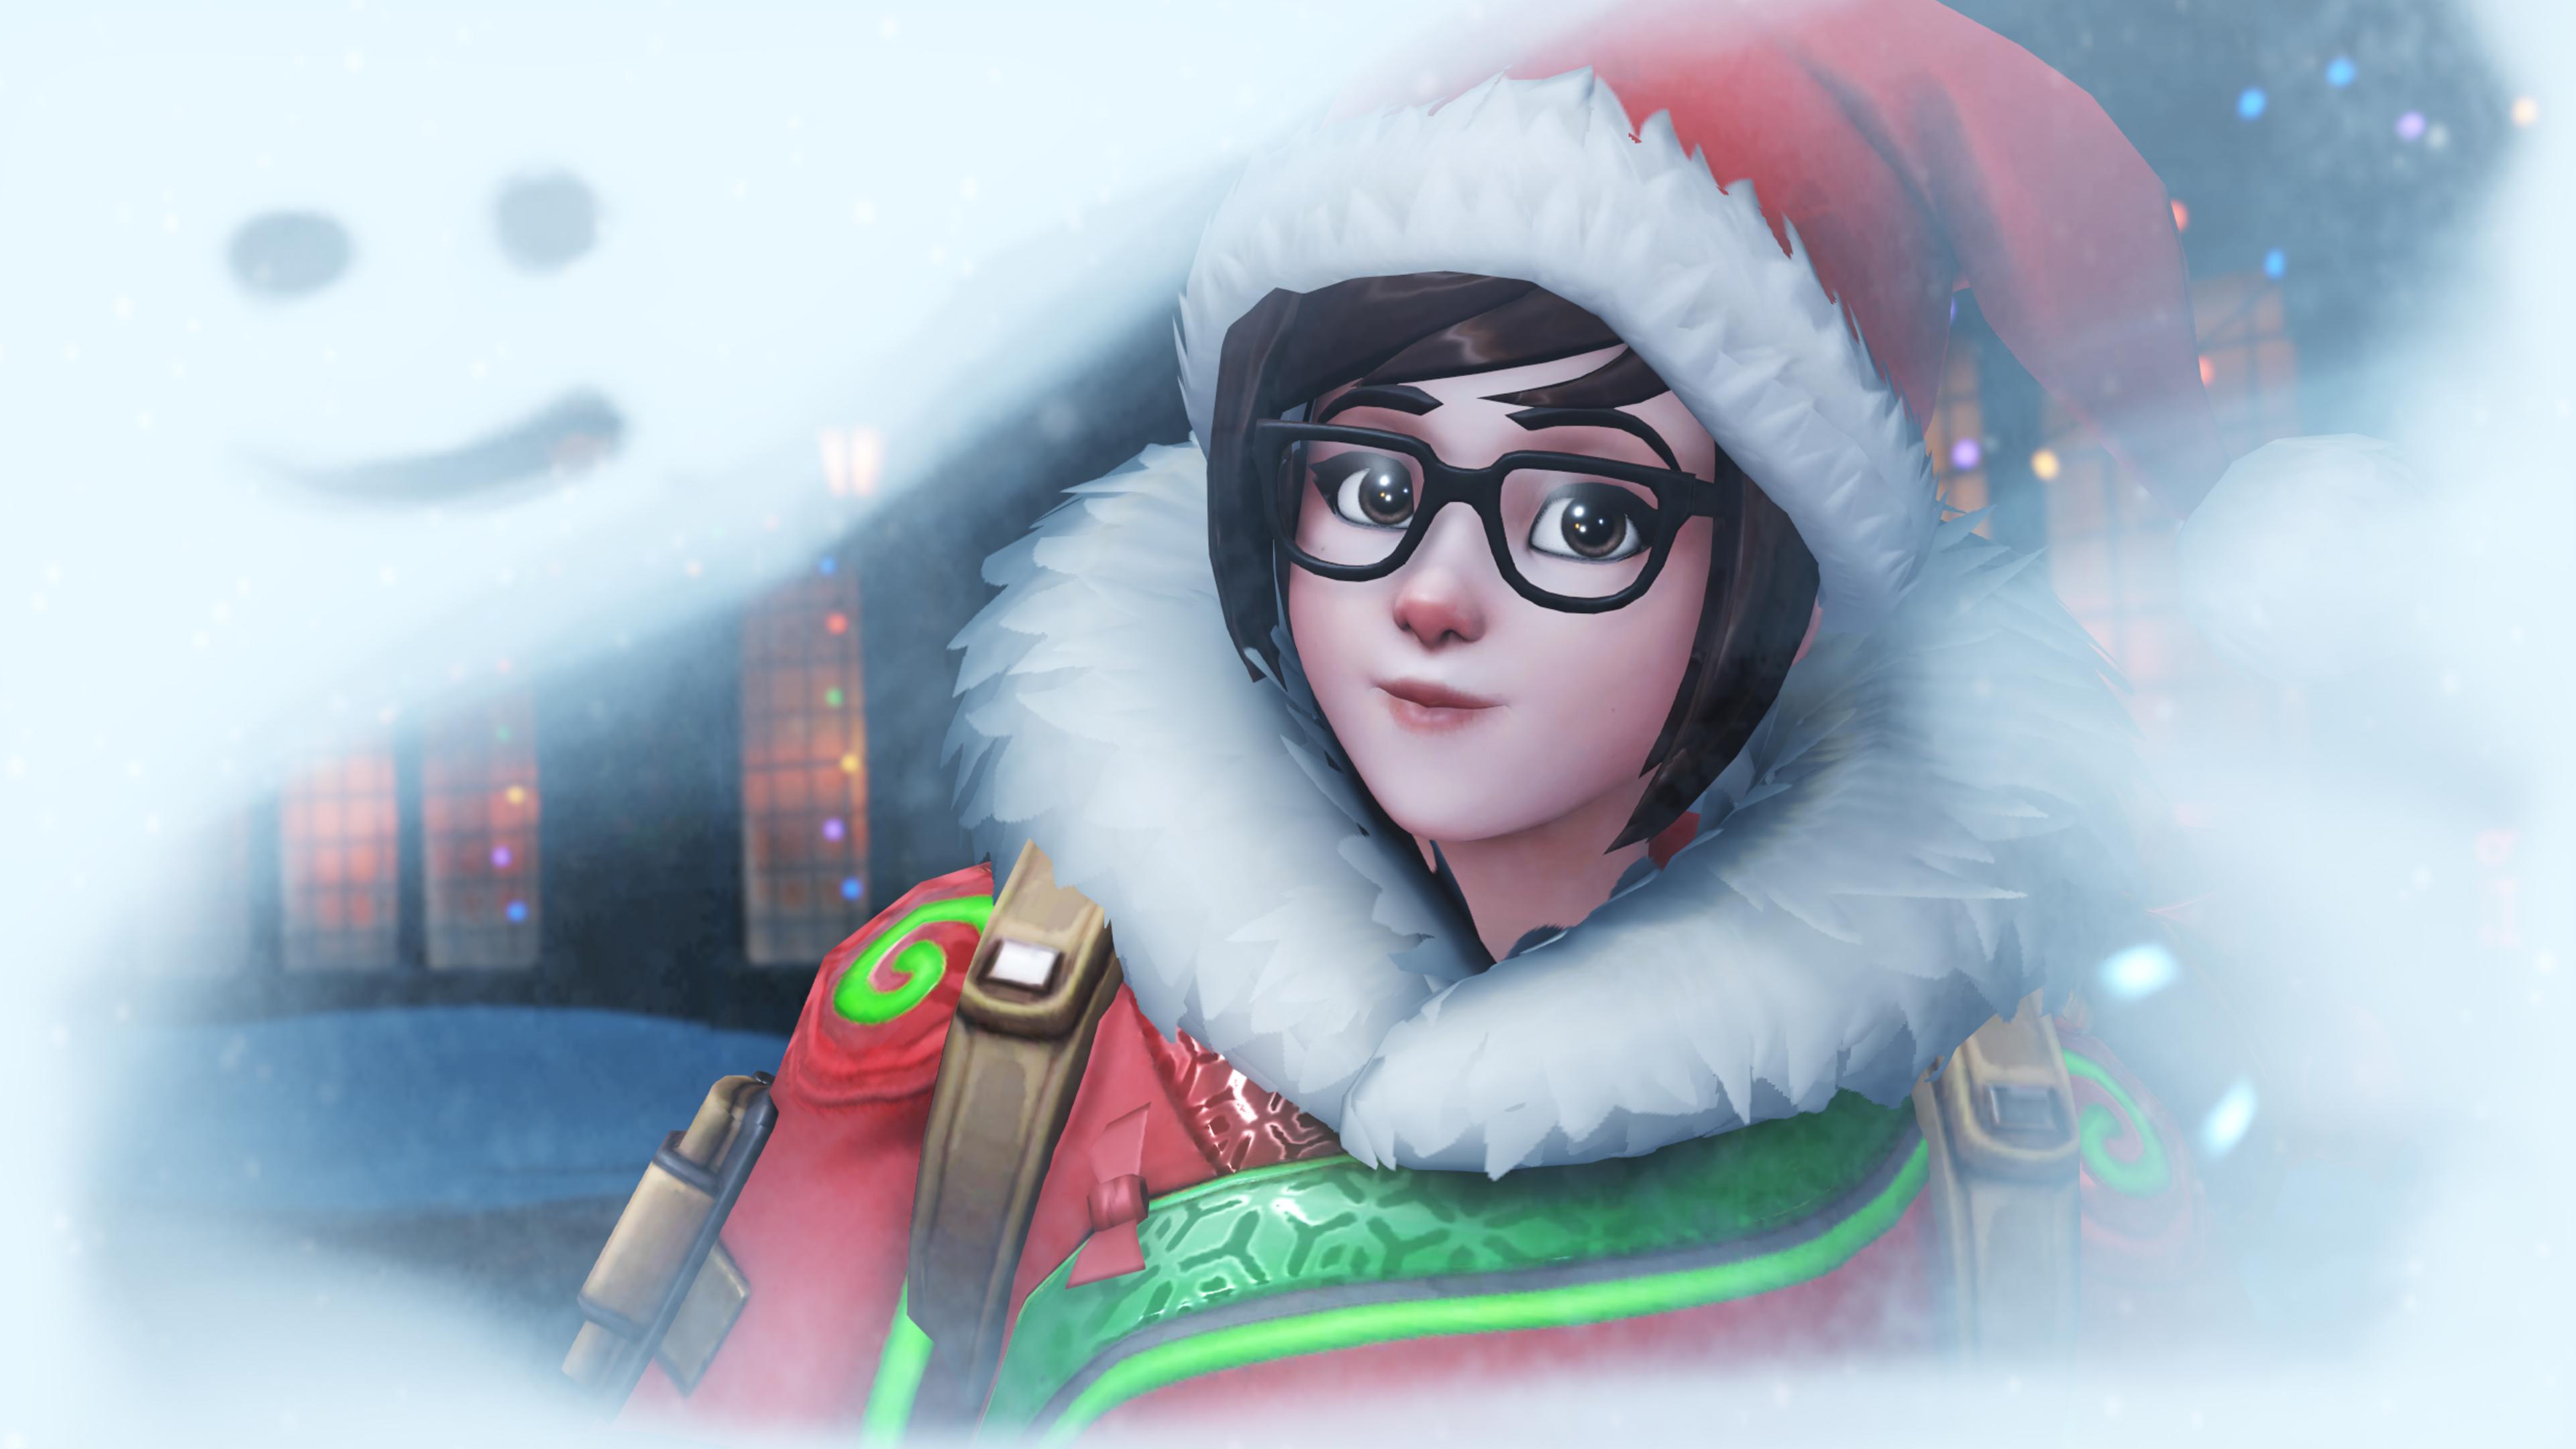 Overwatch Christmas.Pictures Overwatch Christmas Winter Wonderland Female 3840x2160